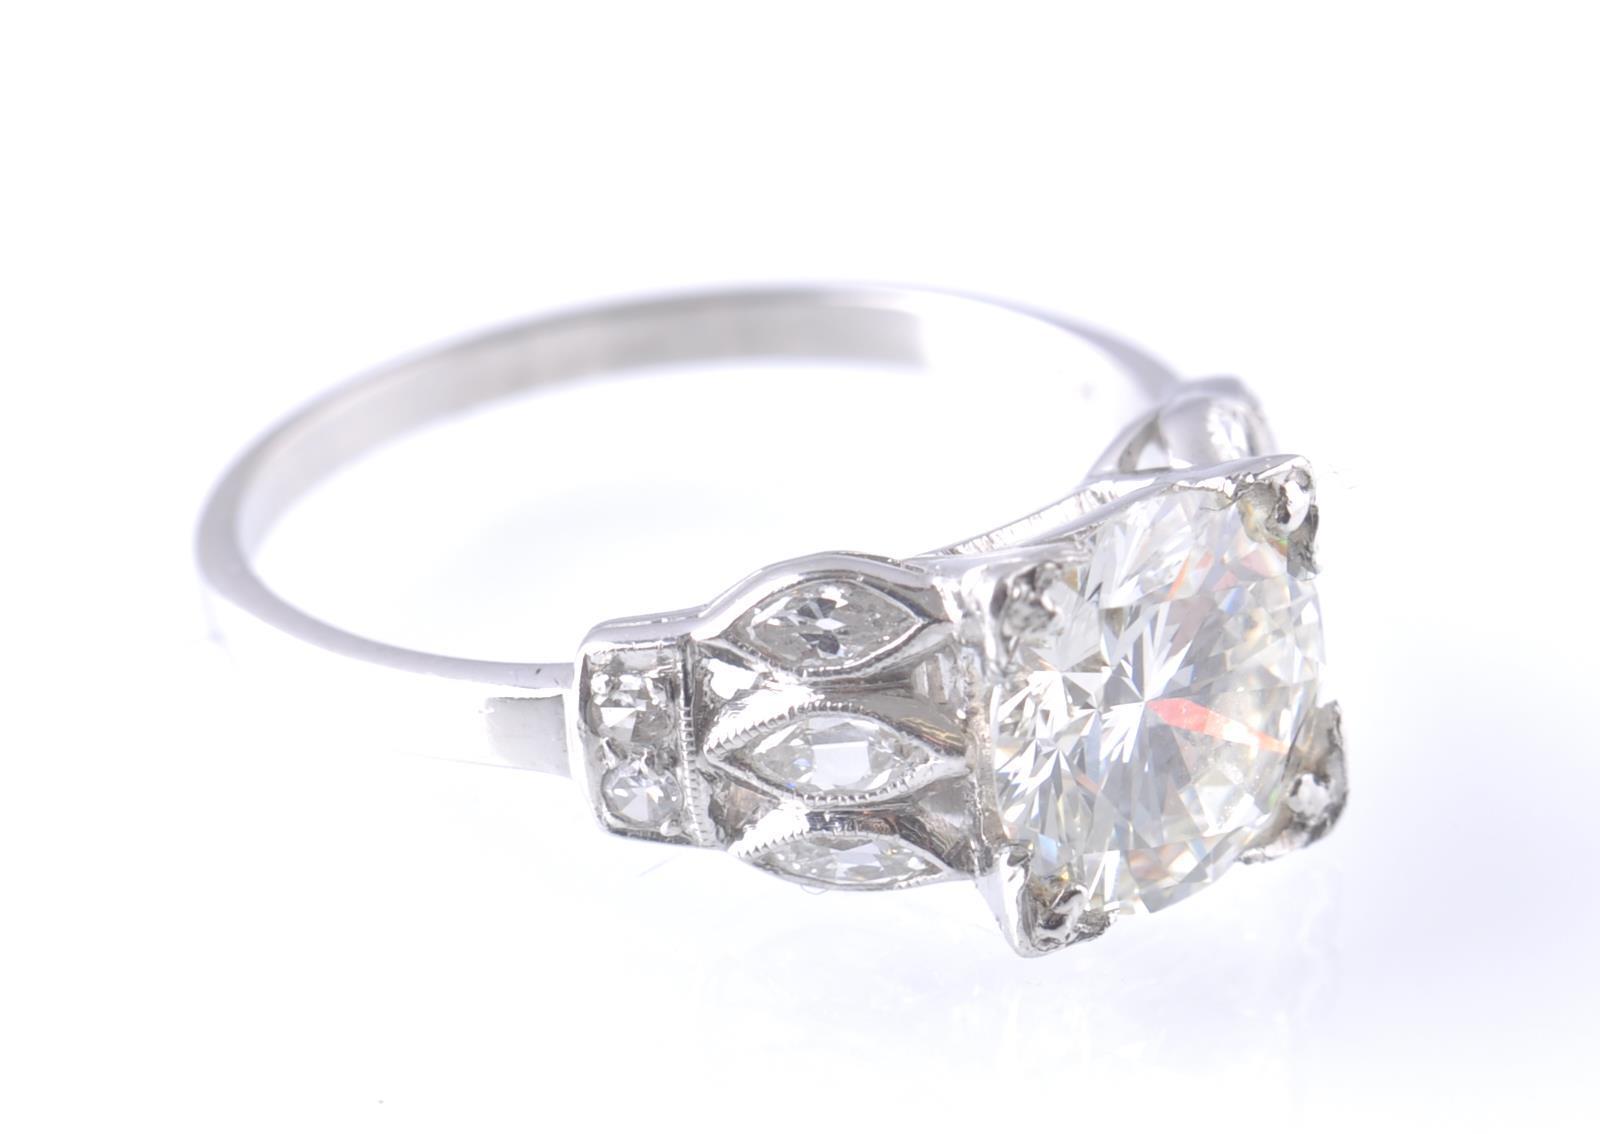 ART DECO PLATINUM AND DIAMOND SOLITAIRE 2CT RING - Image 2 of 5